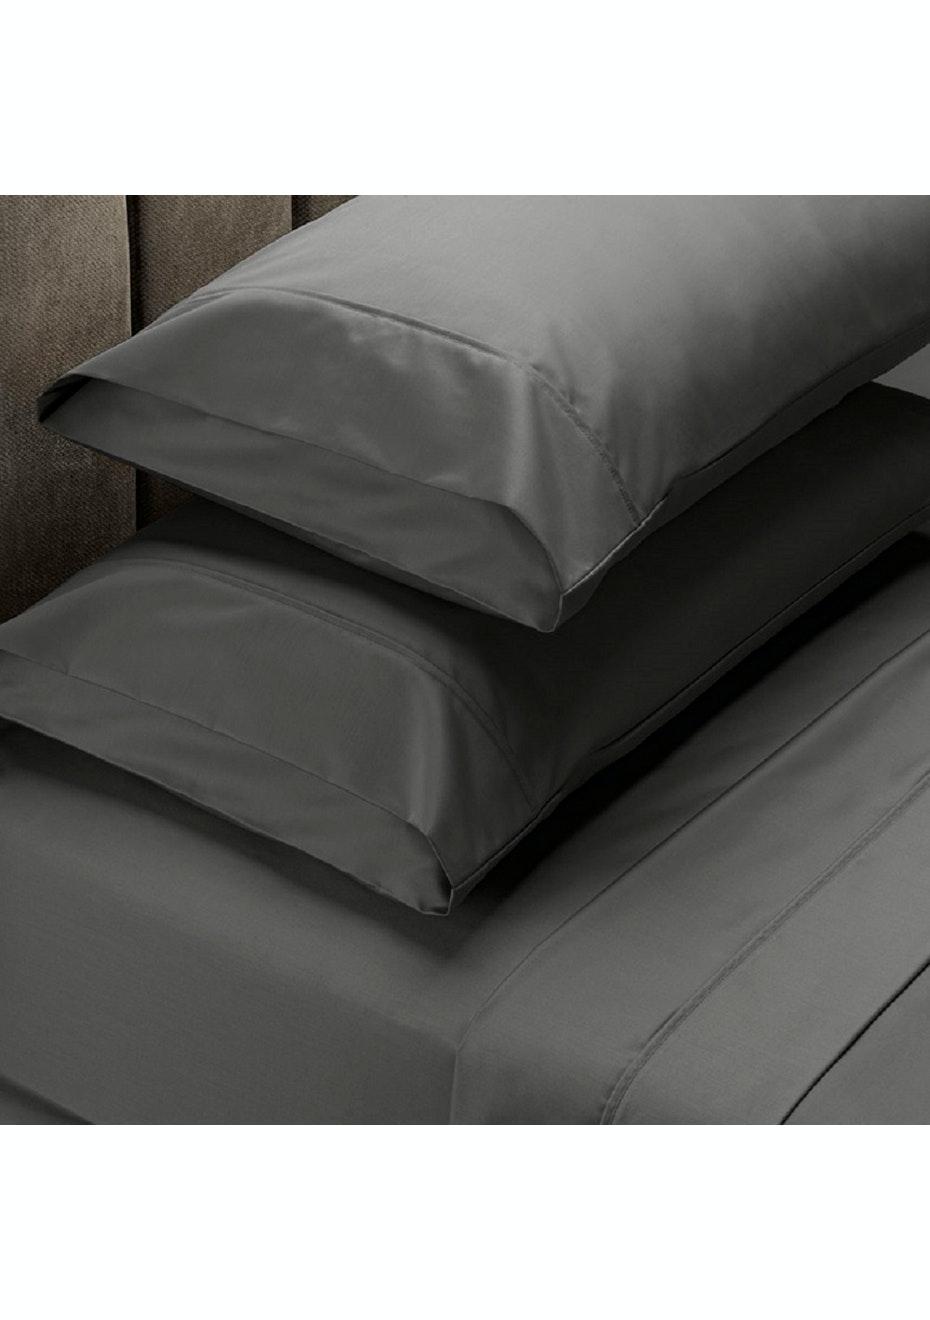 Park Avenue 1000 Thread Count 100% Egyptian Cotton Sheet Sets King - Granite